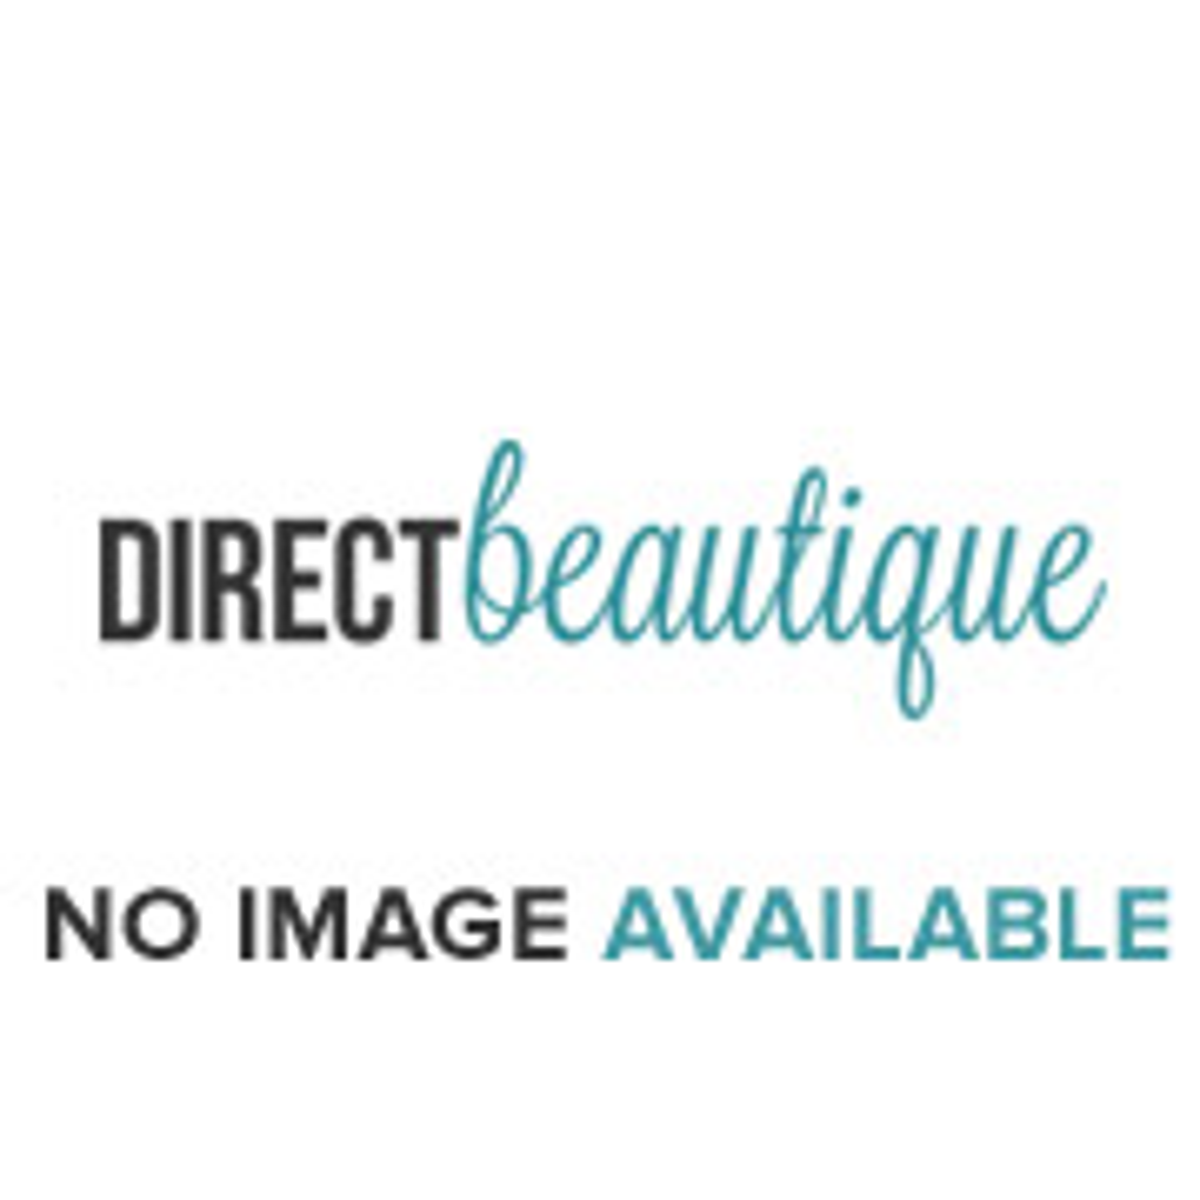 Clarins Blush Prodige 07- Tawny Pink